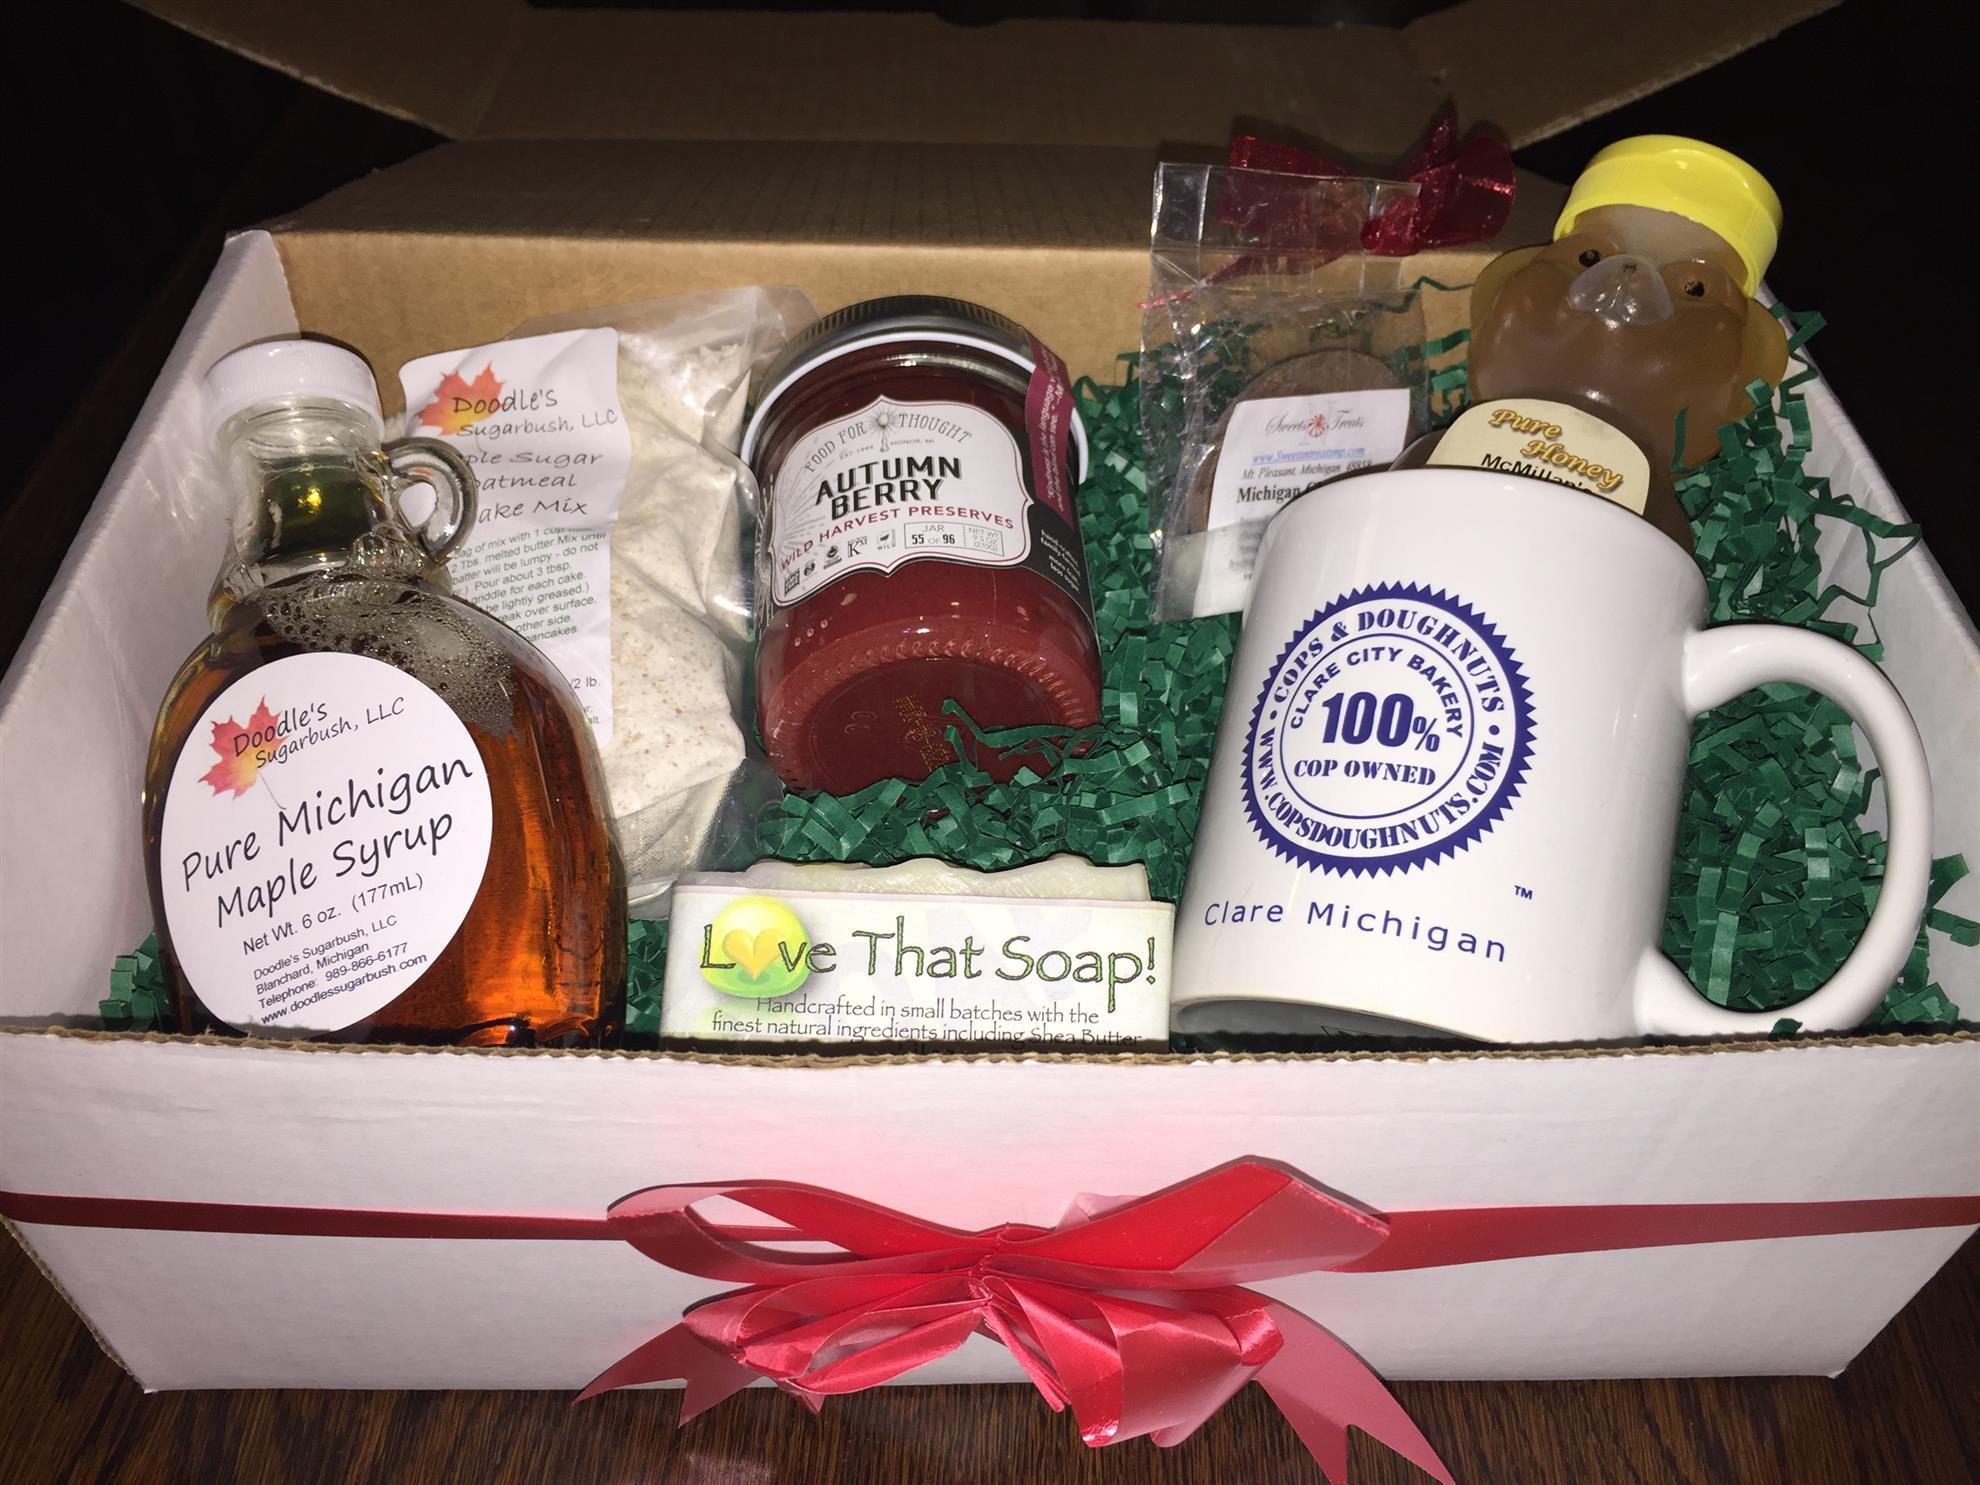 2016 Heart of Michigan Gift Box